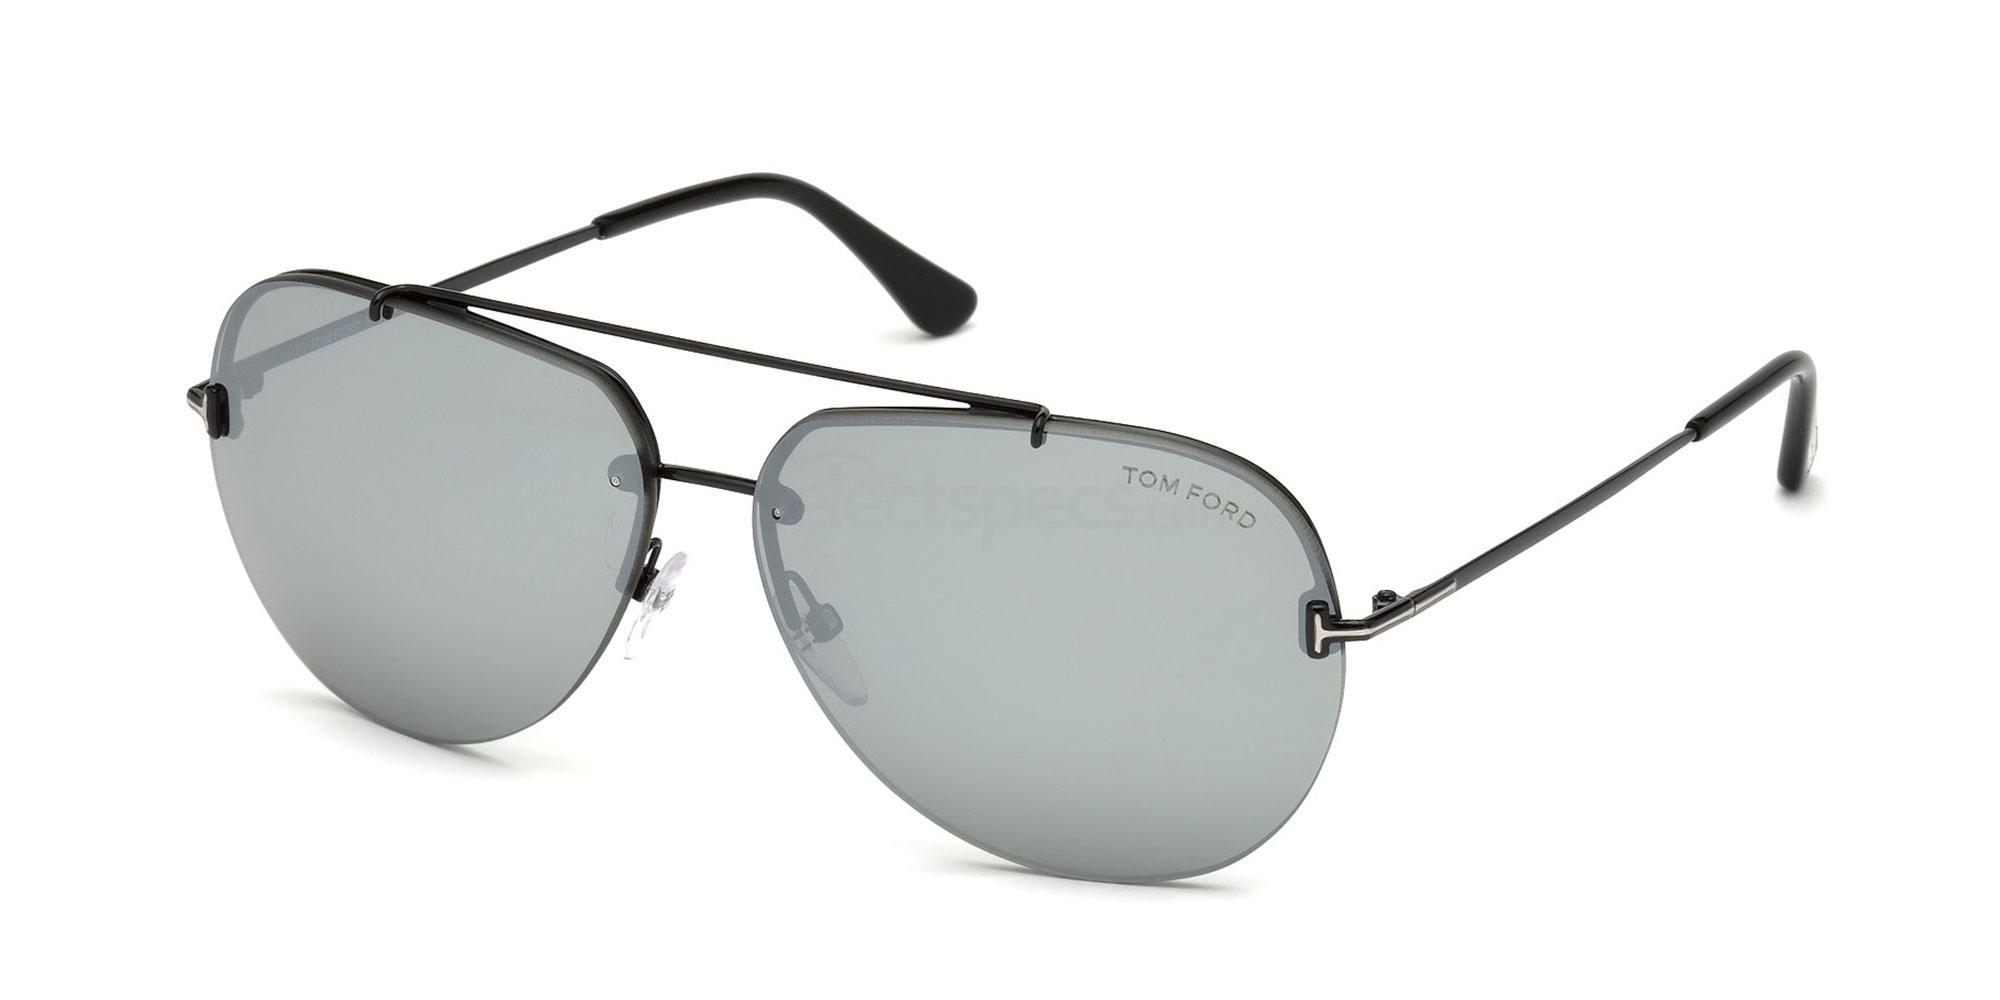 12C FT0584 Sunglasses, Tom Ford